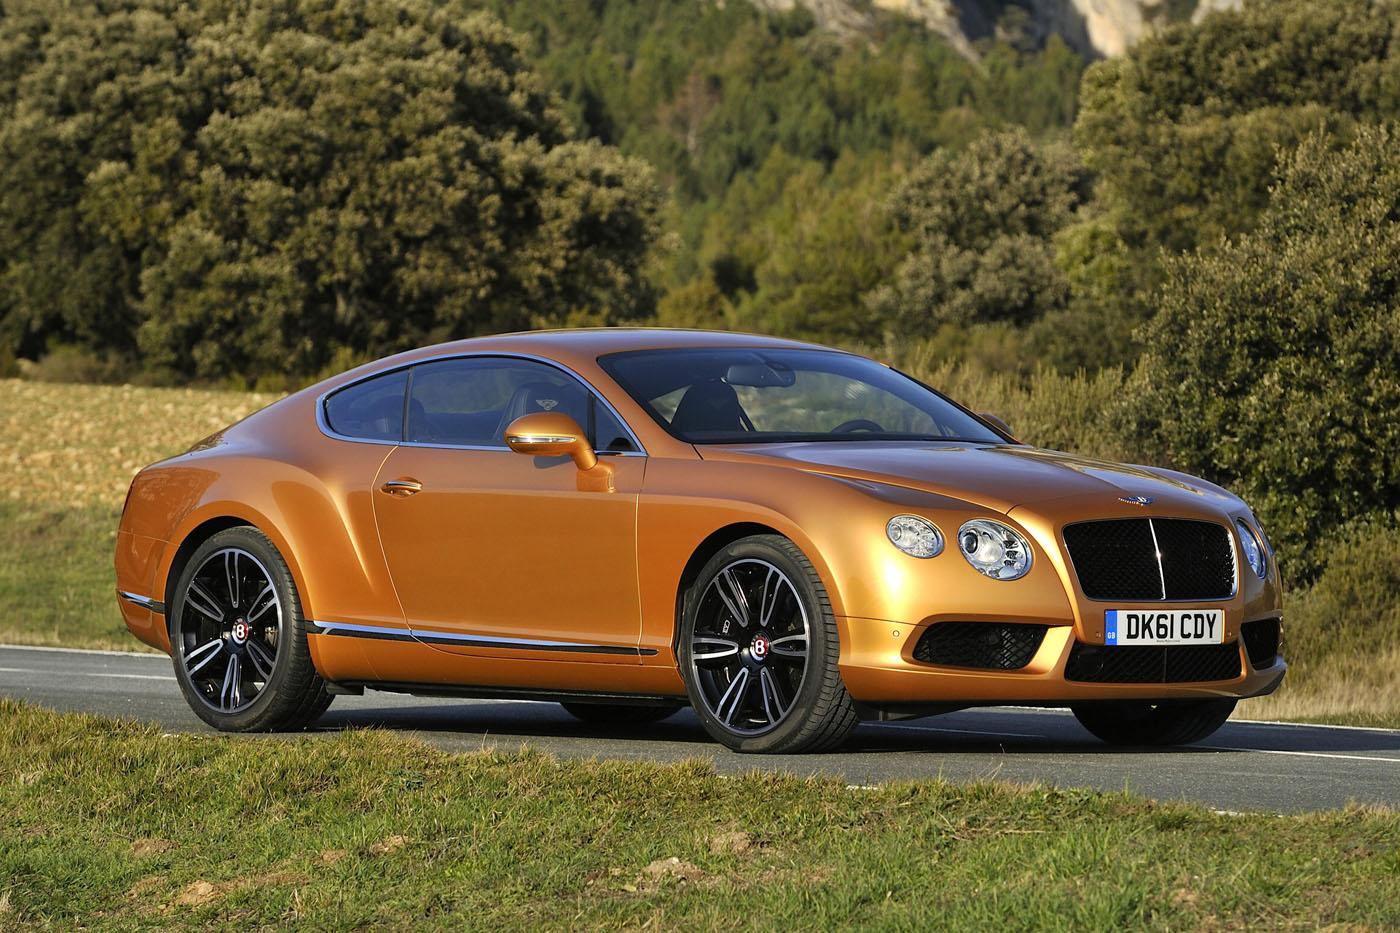 Bentley Continental GT 1 edycja